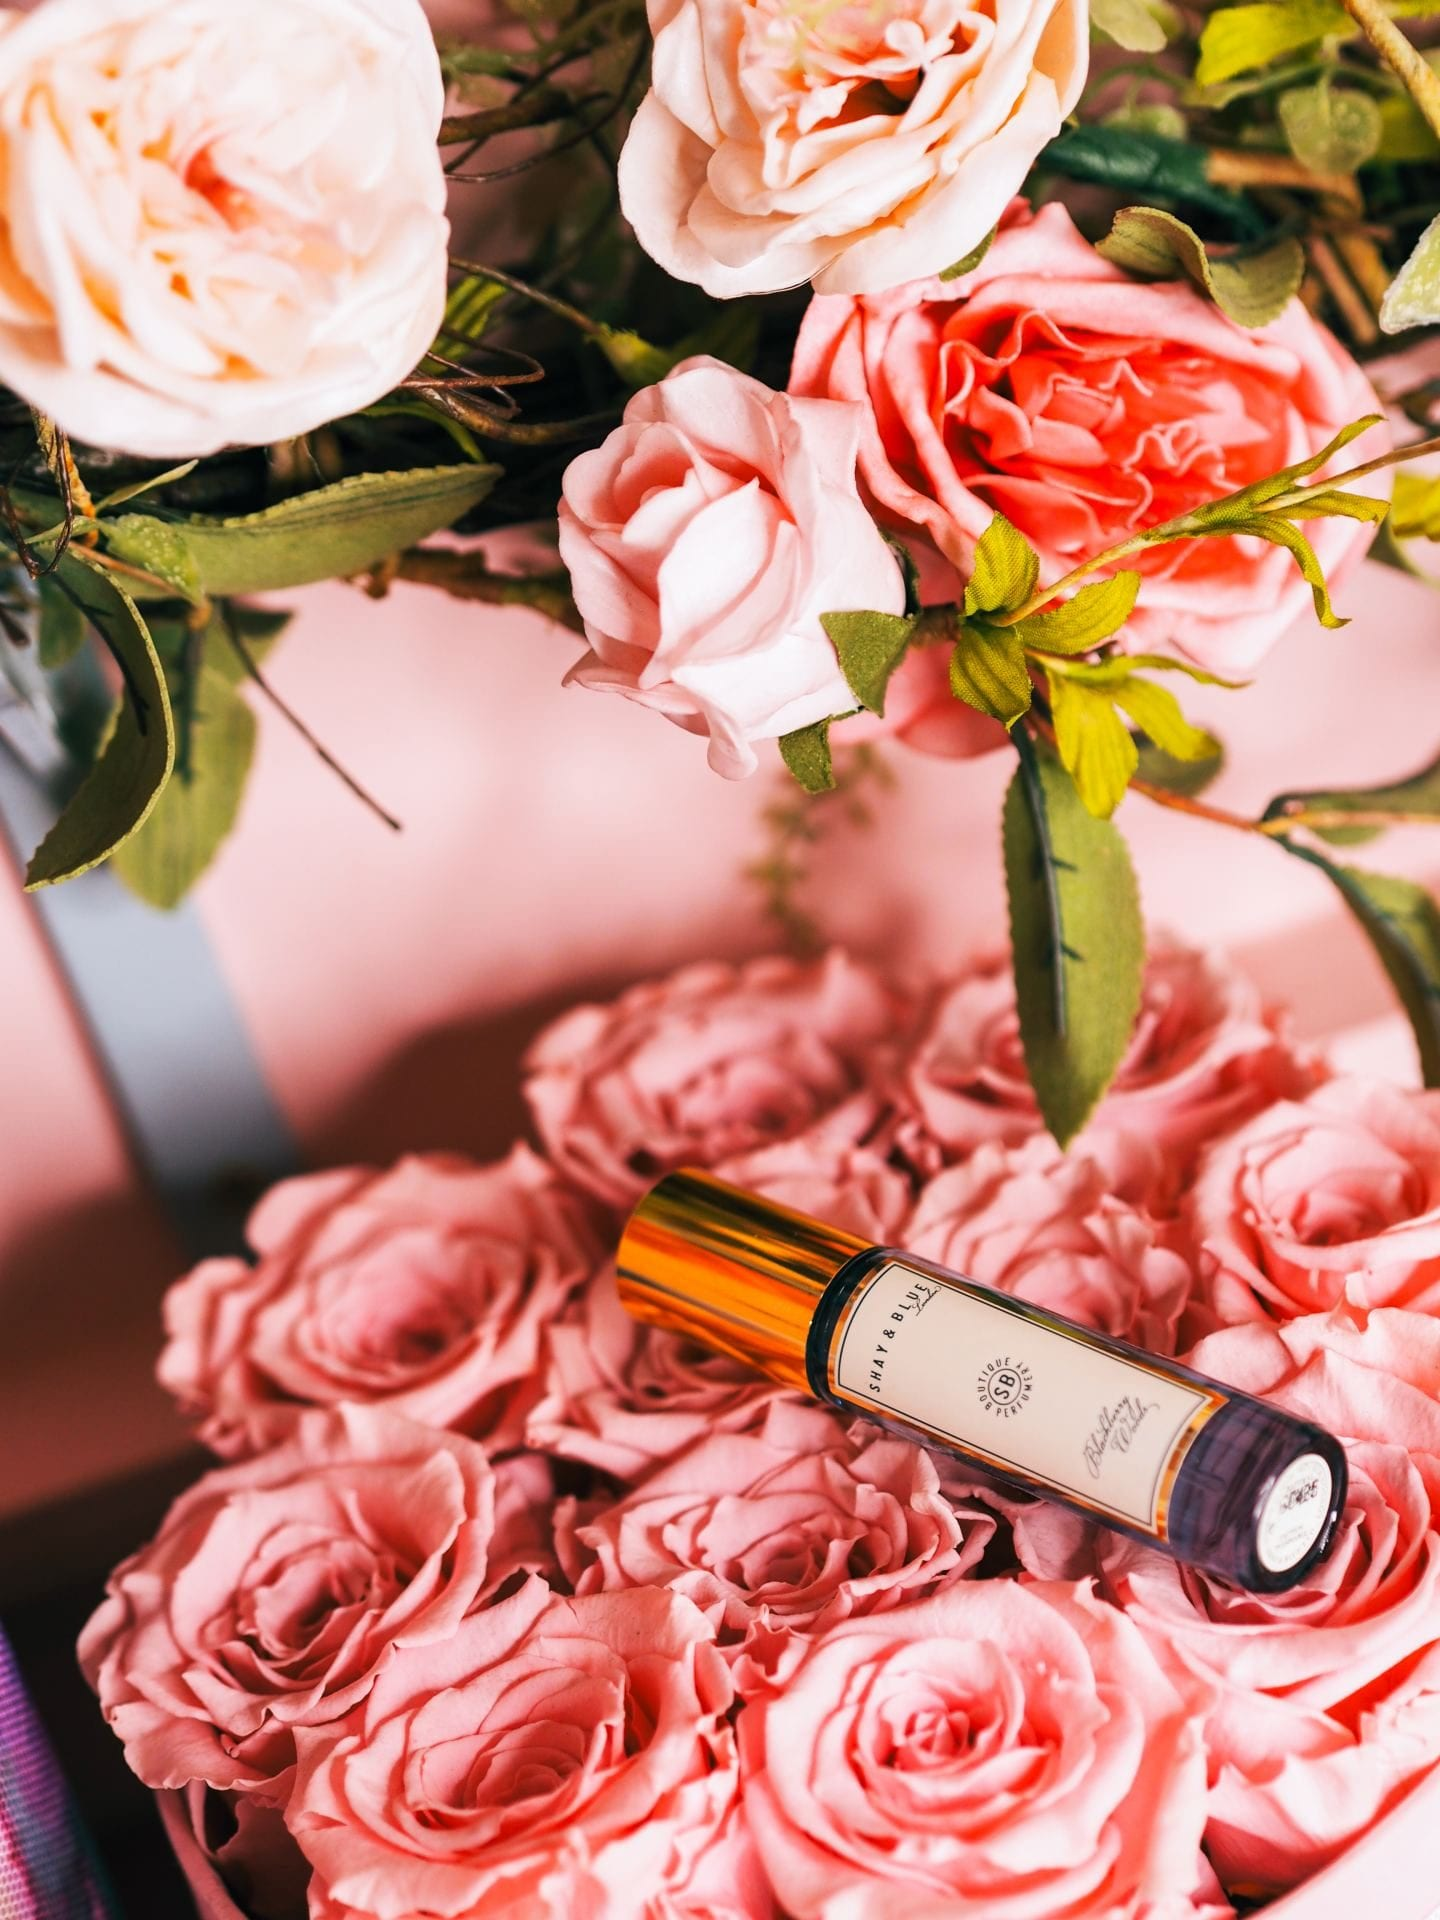 Shay & Blue 'Blackberry Woods' Handbag Sized Perfume 1